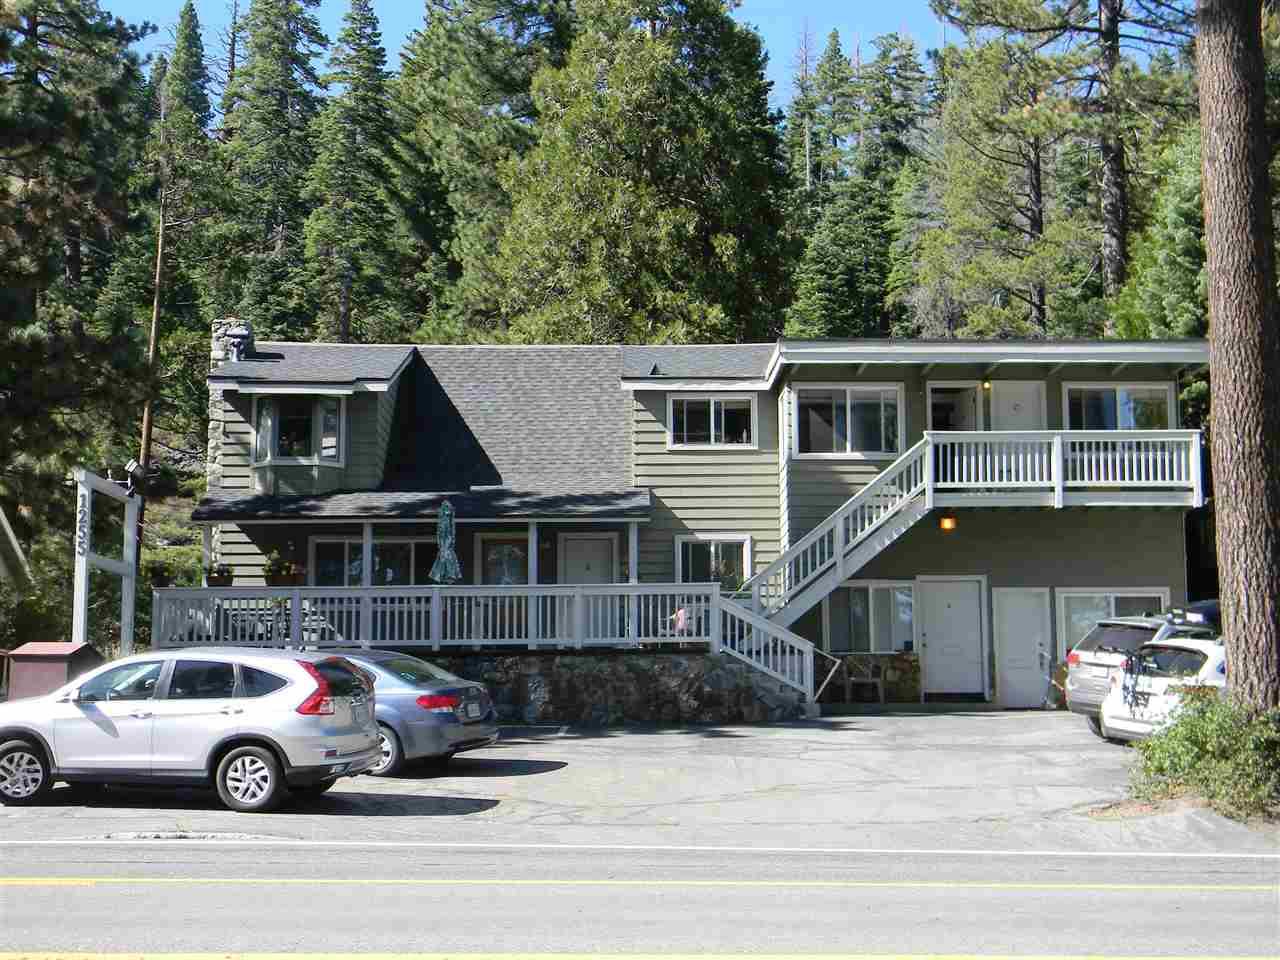 Image for 1255 North Lake Boulevard, Tahoe City, CA 96145